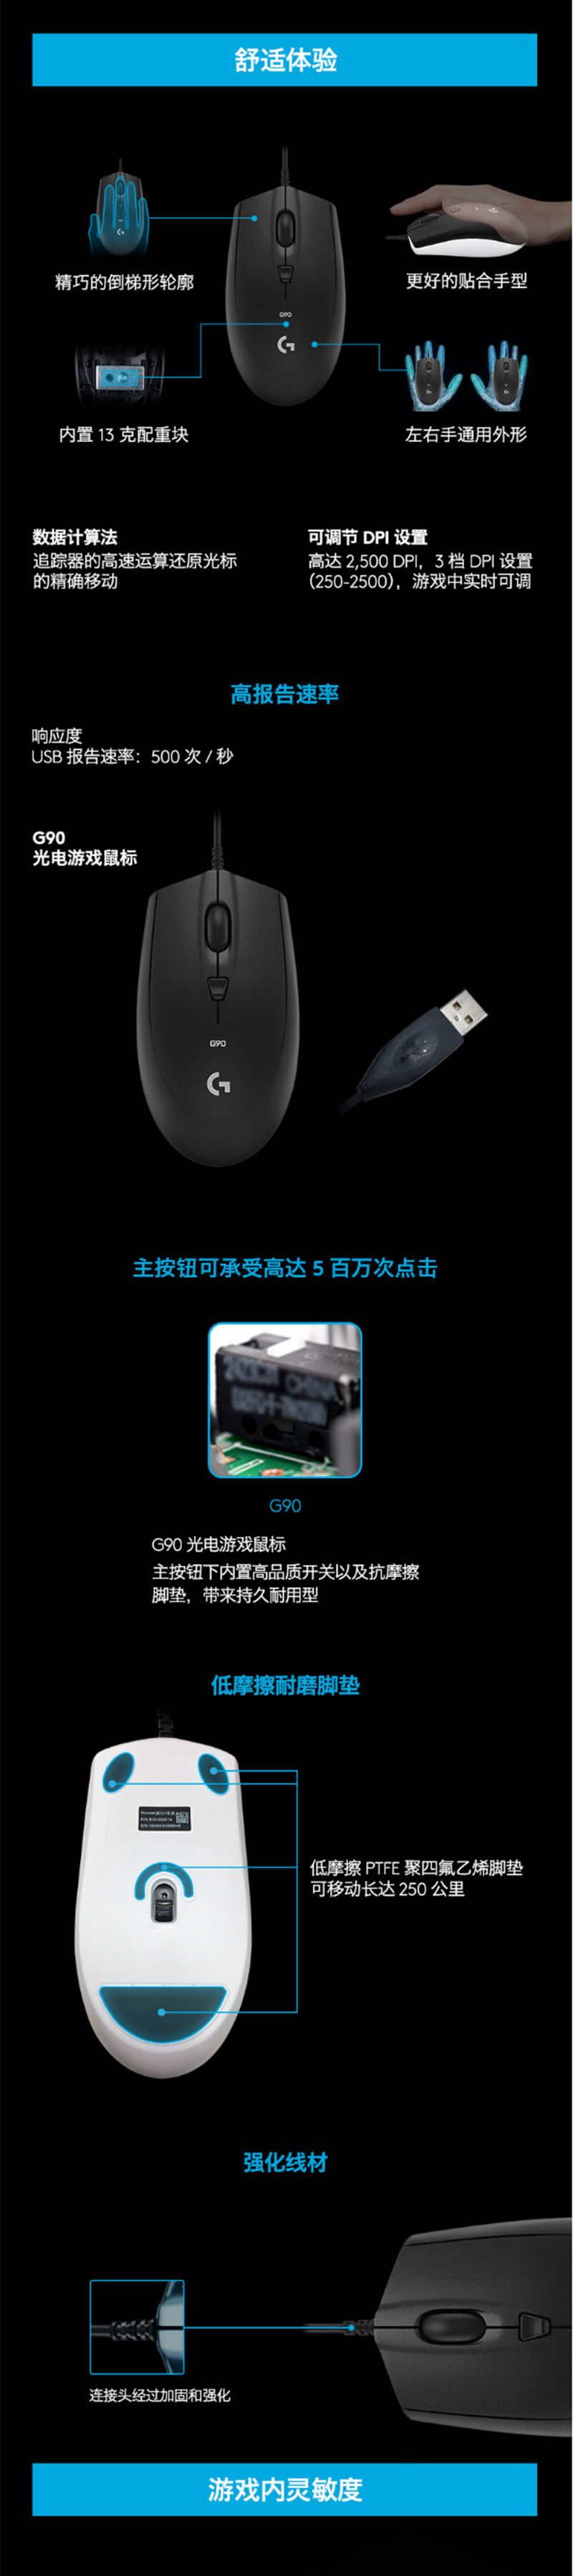 G90光电游戏鼠标